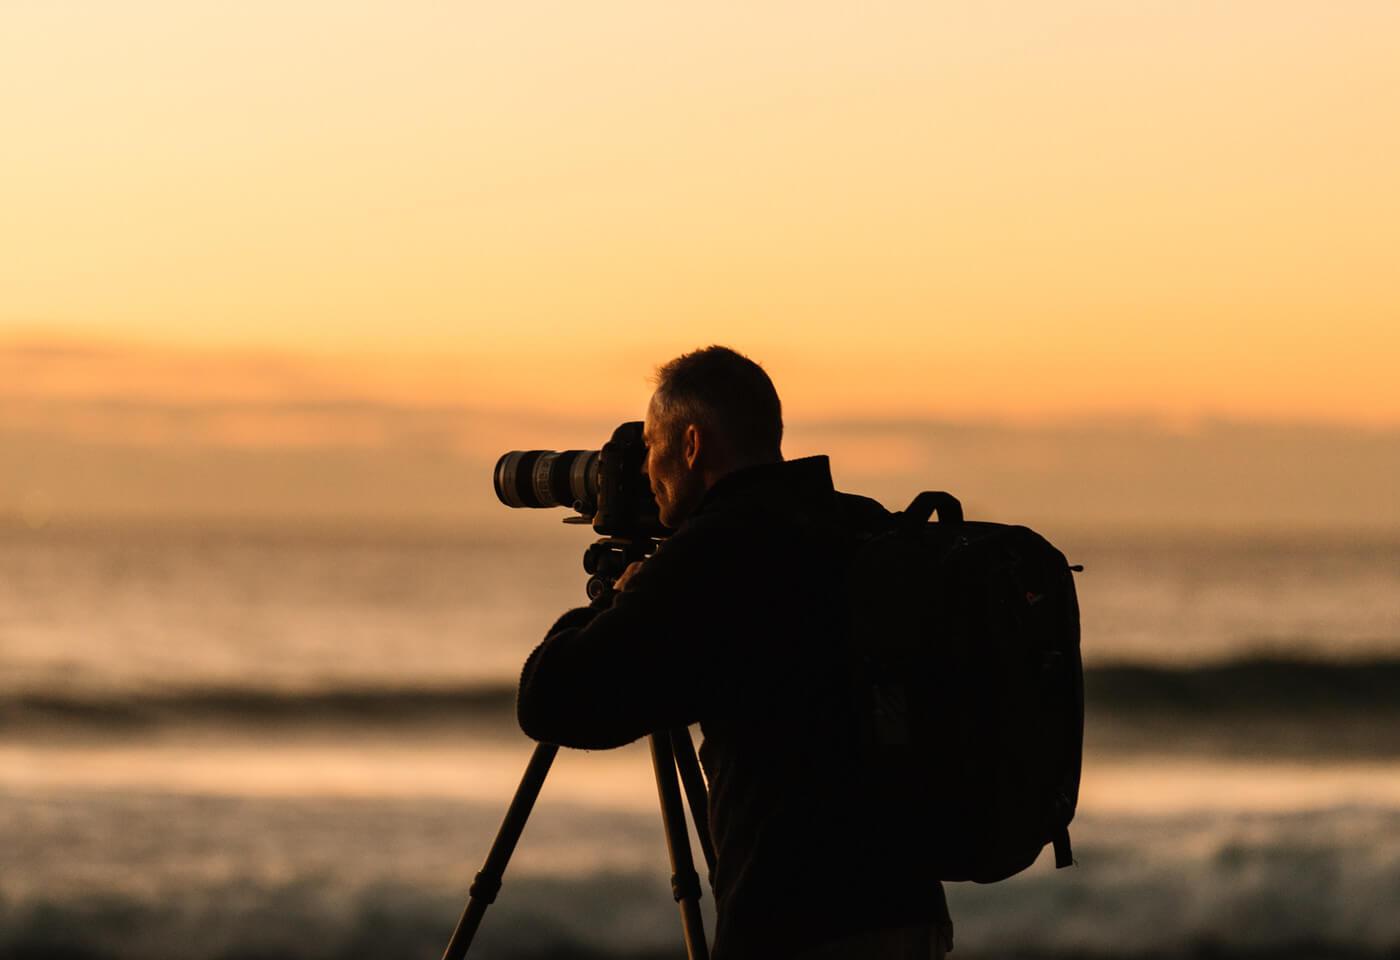 Man photographing sunrise